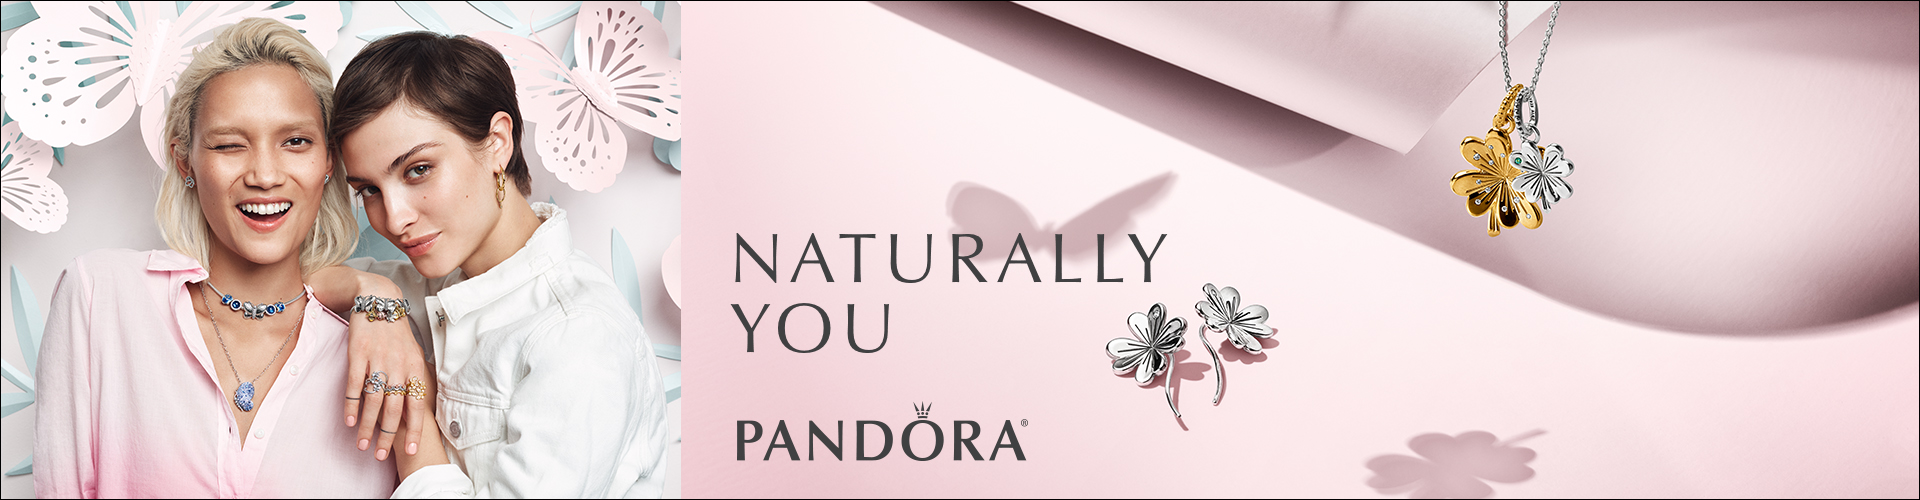 Yours Naturally Pandoara